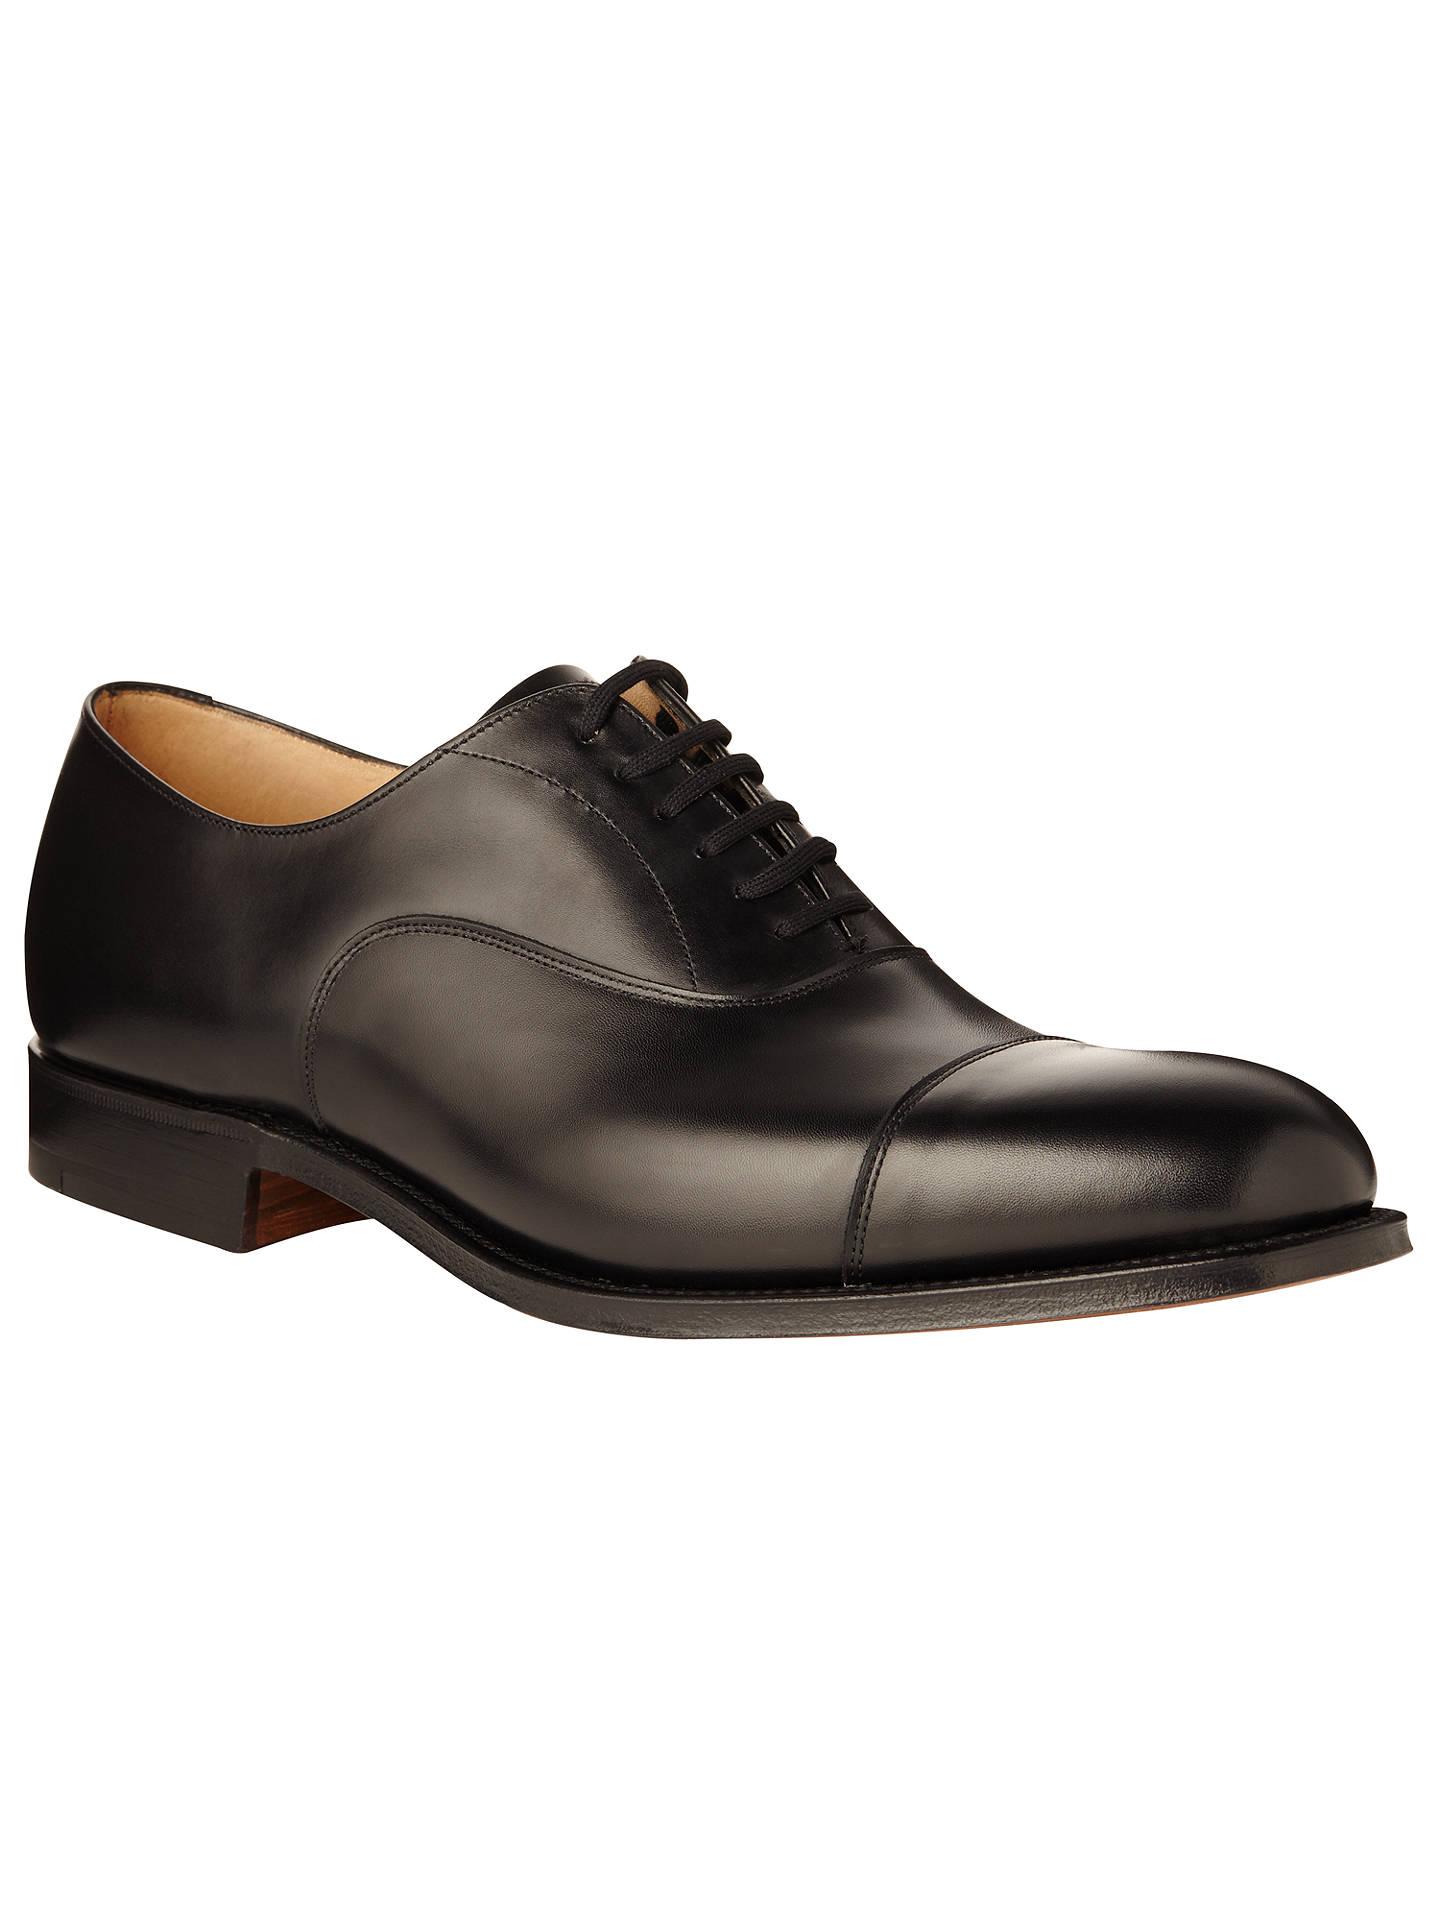 937188591a40 Buy Church s Dubai Leather Oxford Shoes